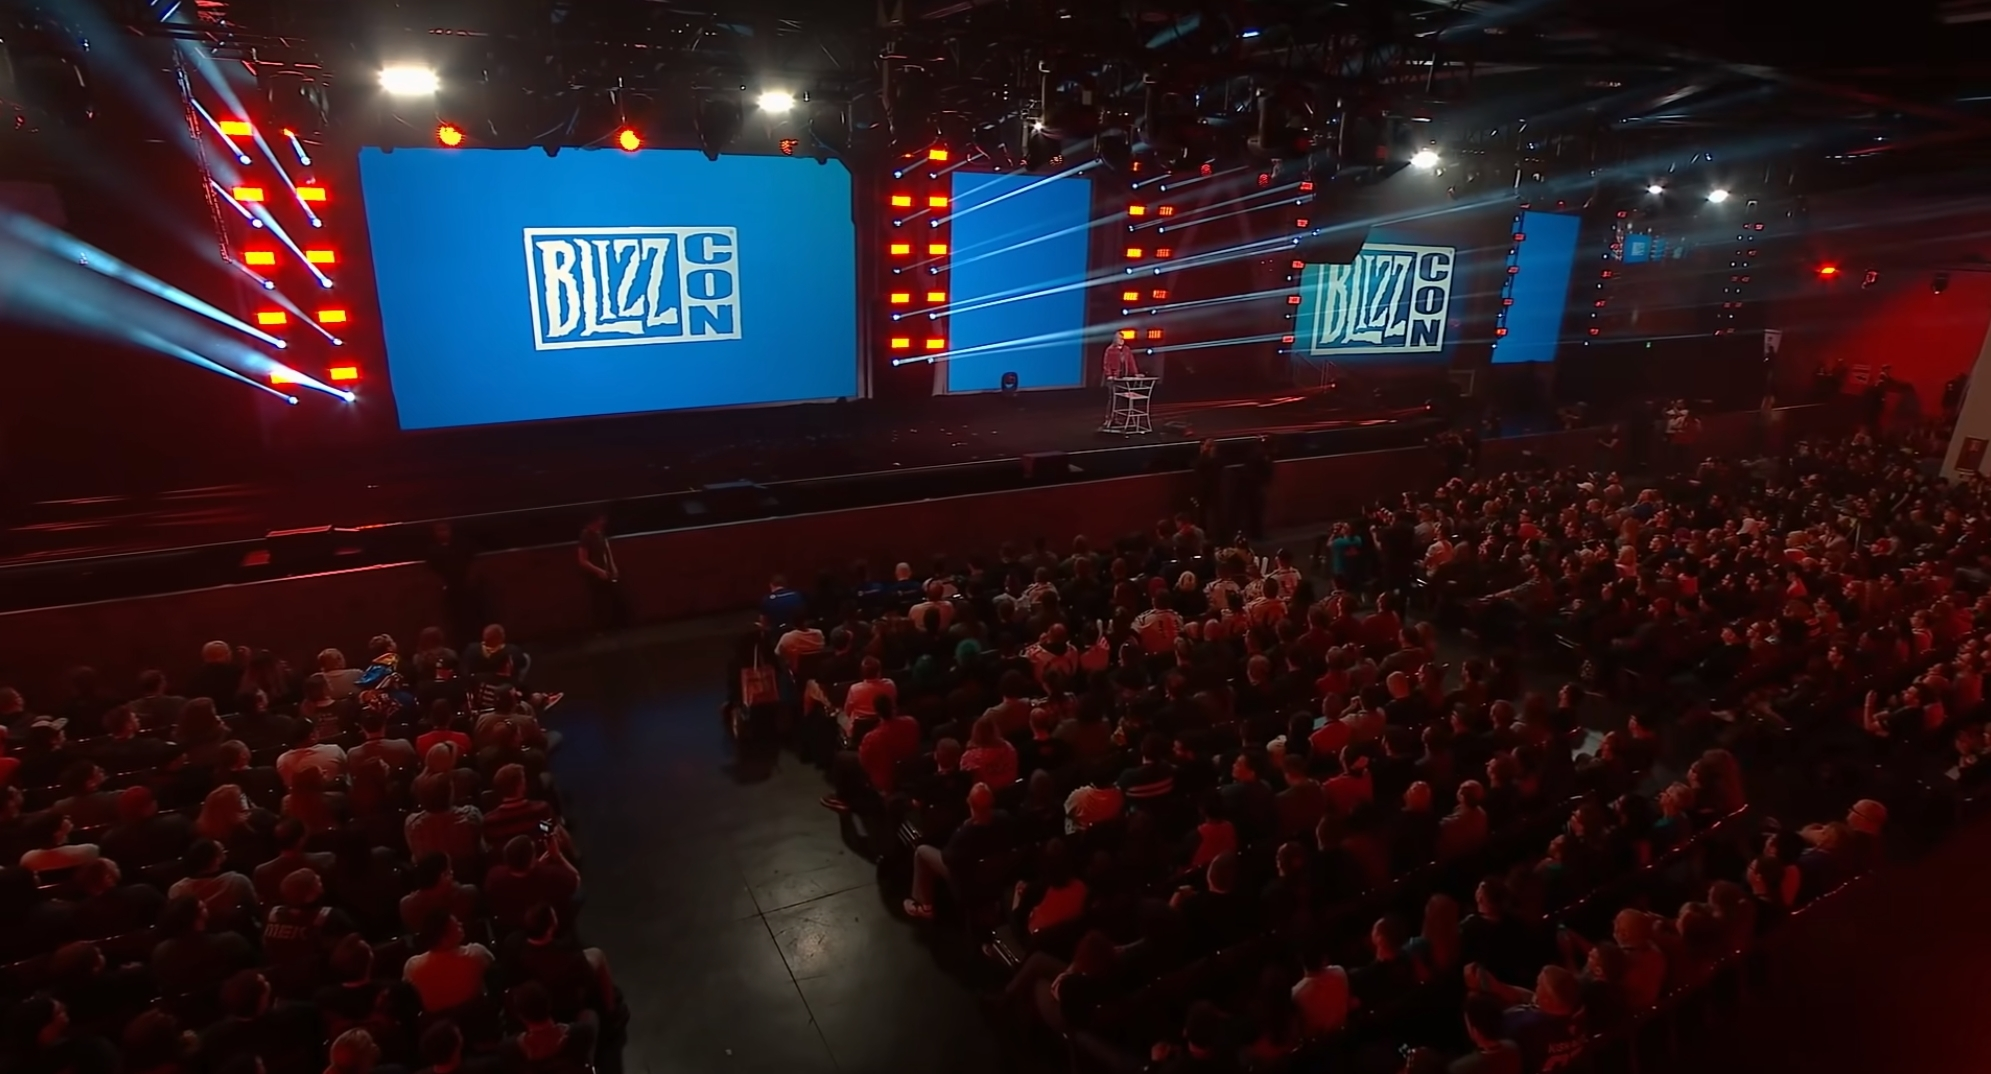 Development Studio Vicarious Visions Set To Merge Into Blizzard Entertainment